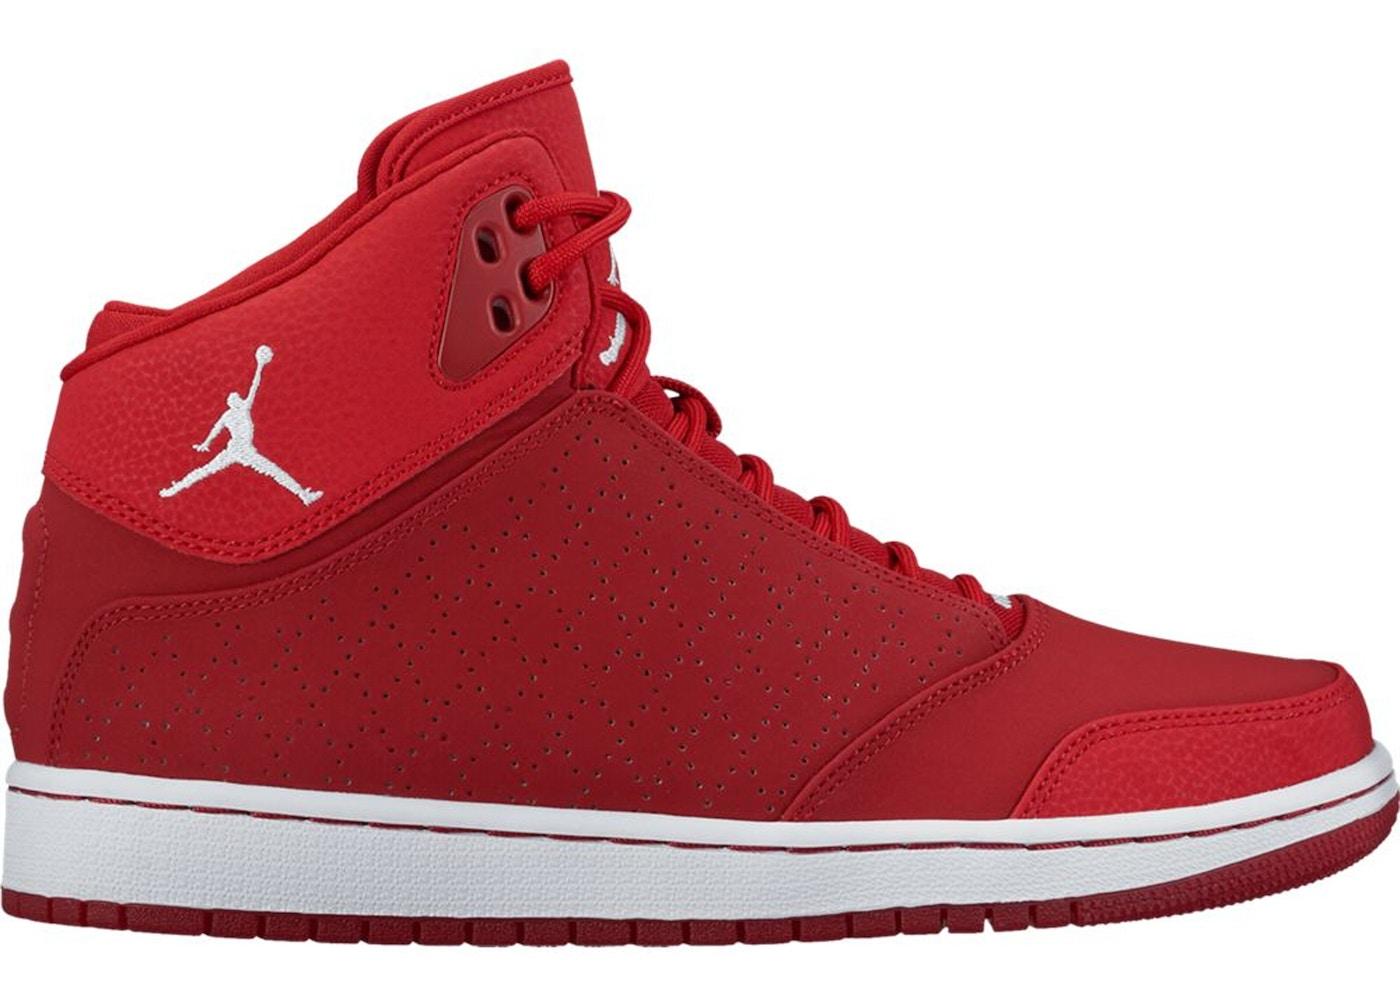 Jordan 1 Flight 5 Gym Red - 881434-600